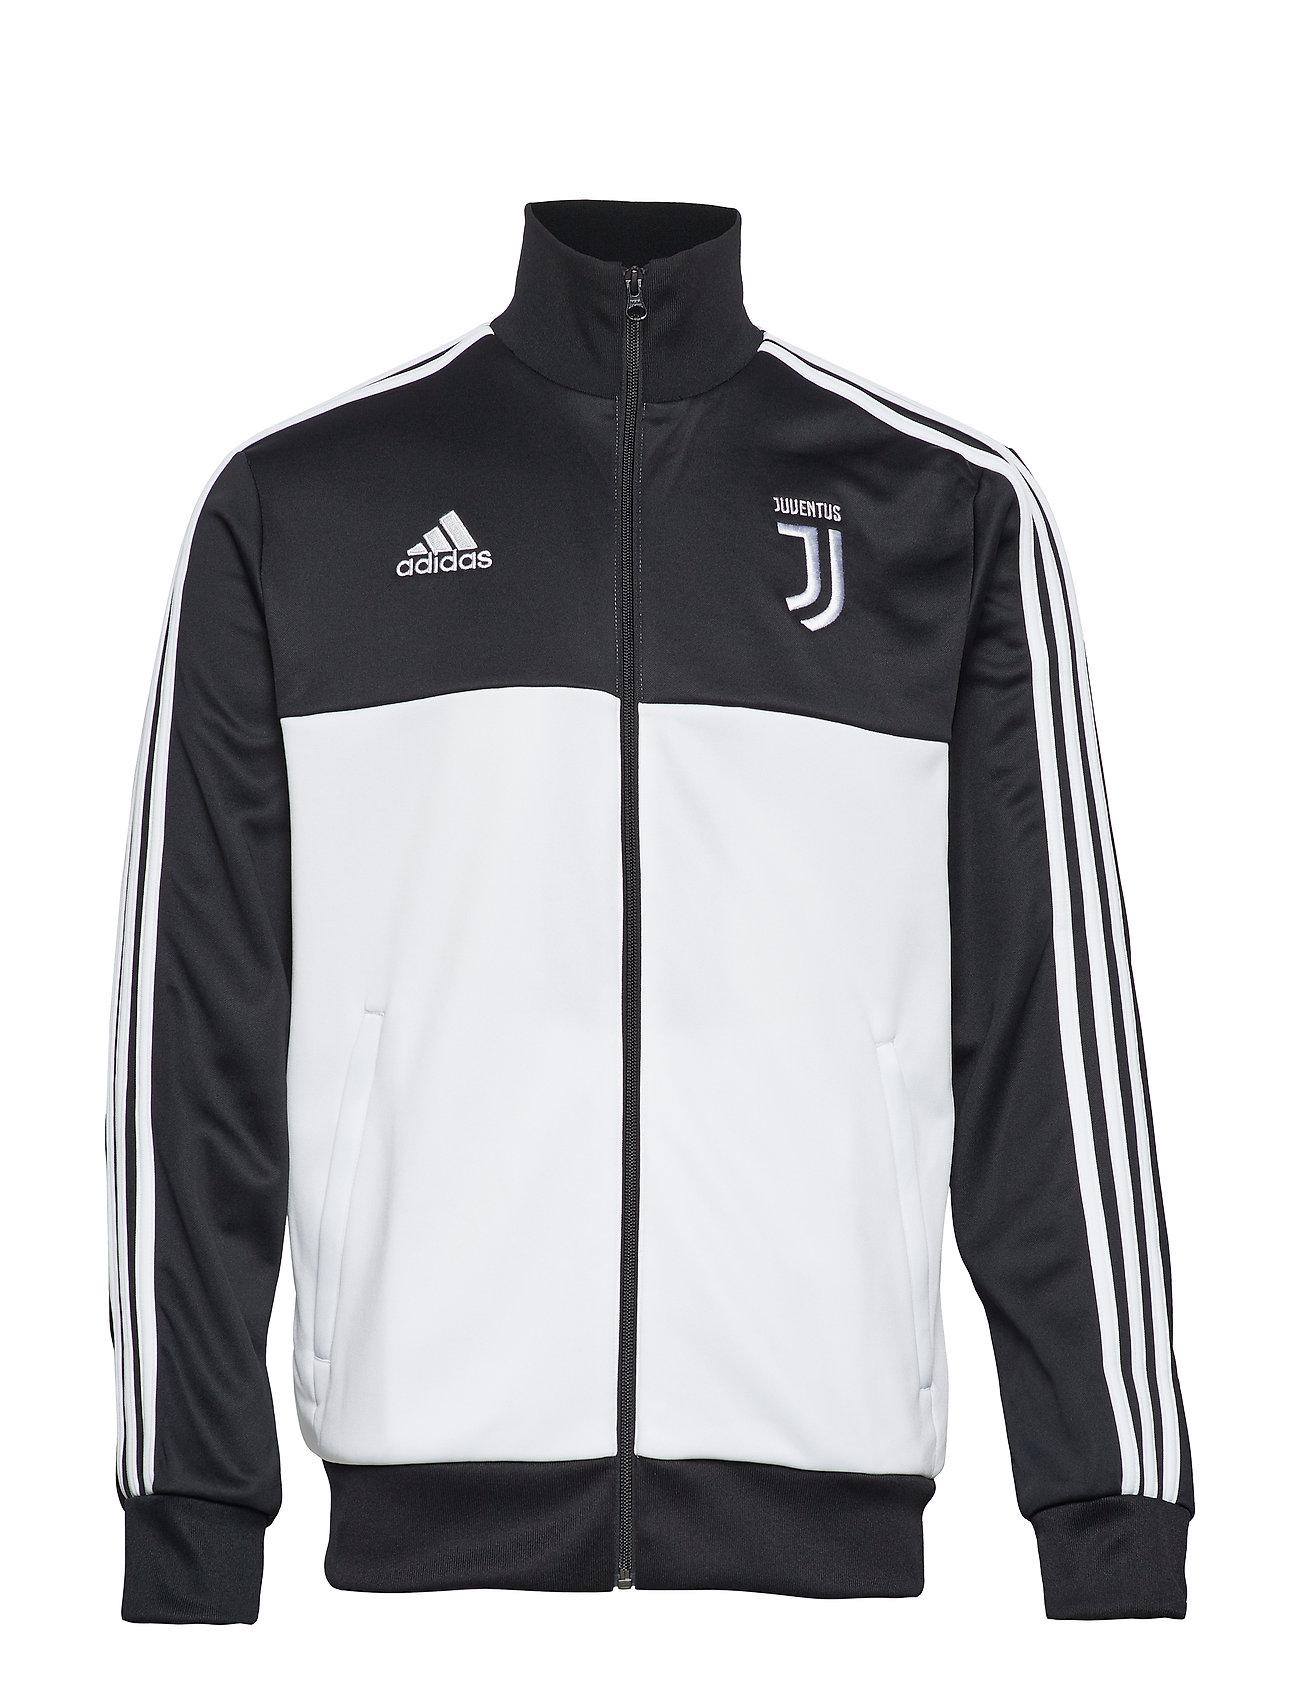 adidas Performance JUVE 3S TRK TOP - BLACK/WHITE